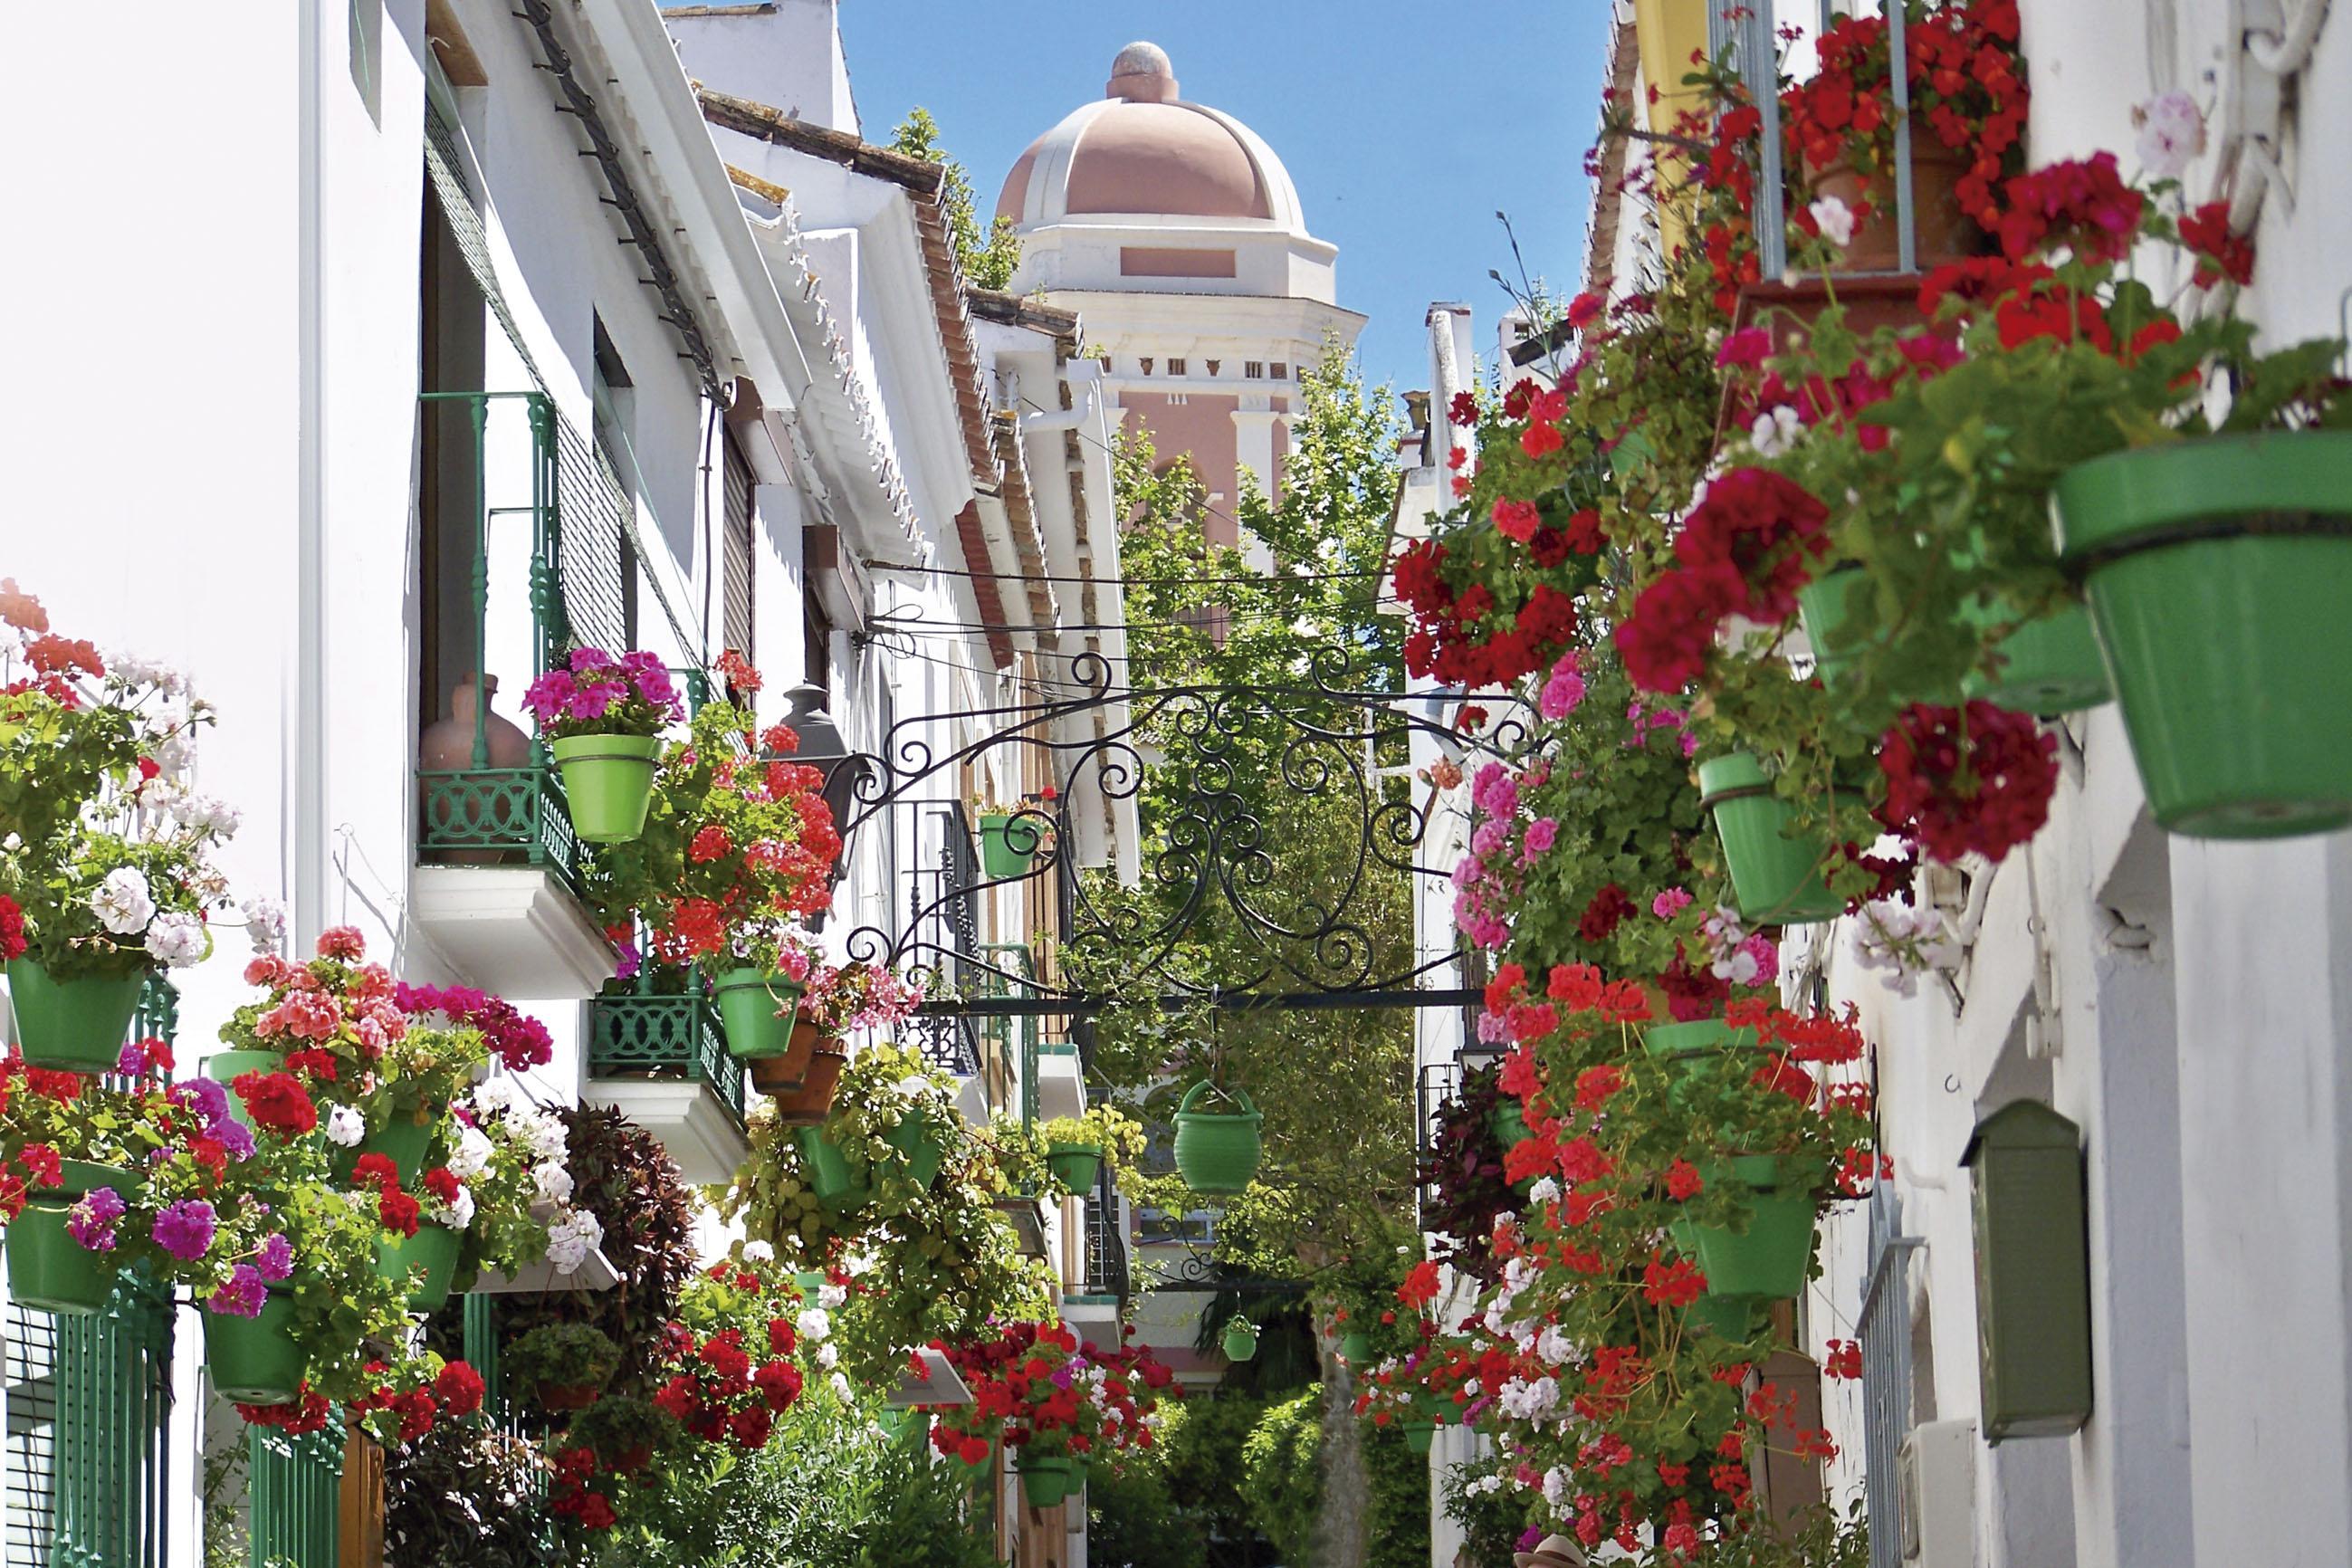 Estepona, a thoroughly modern town